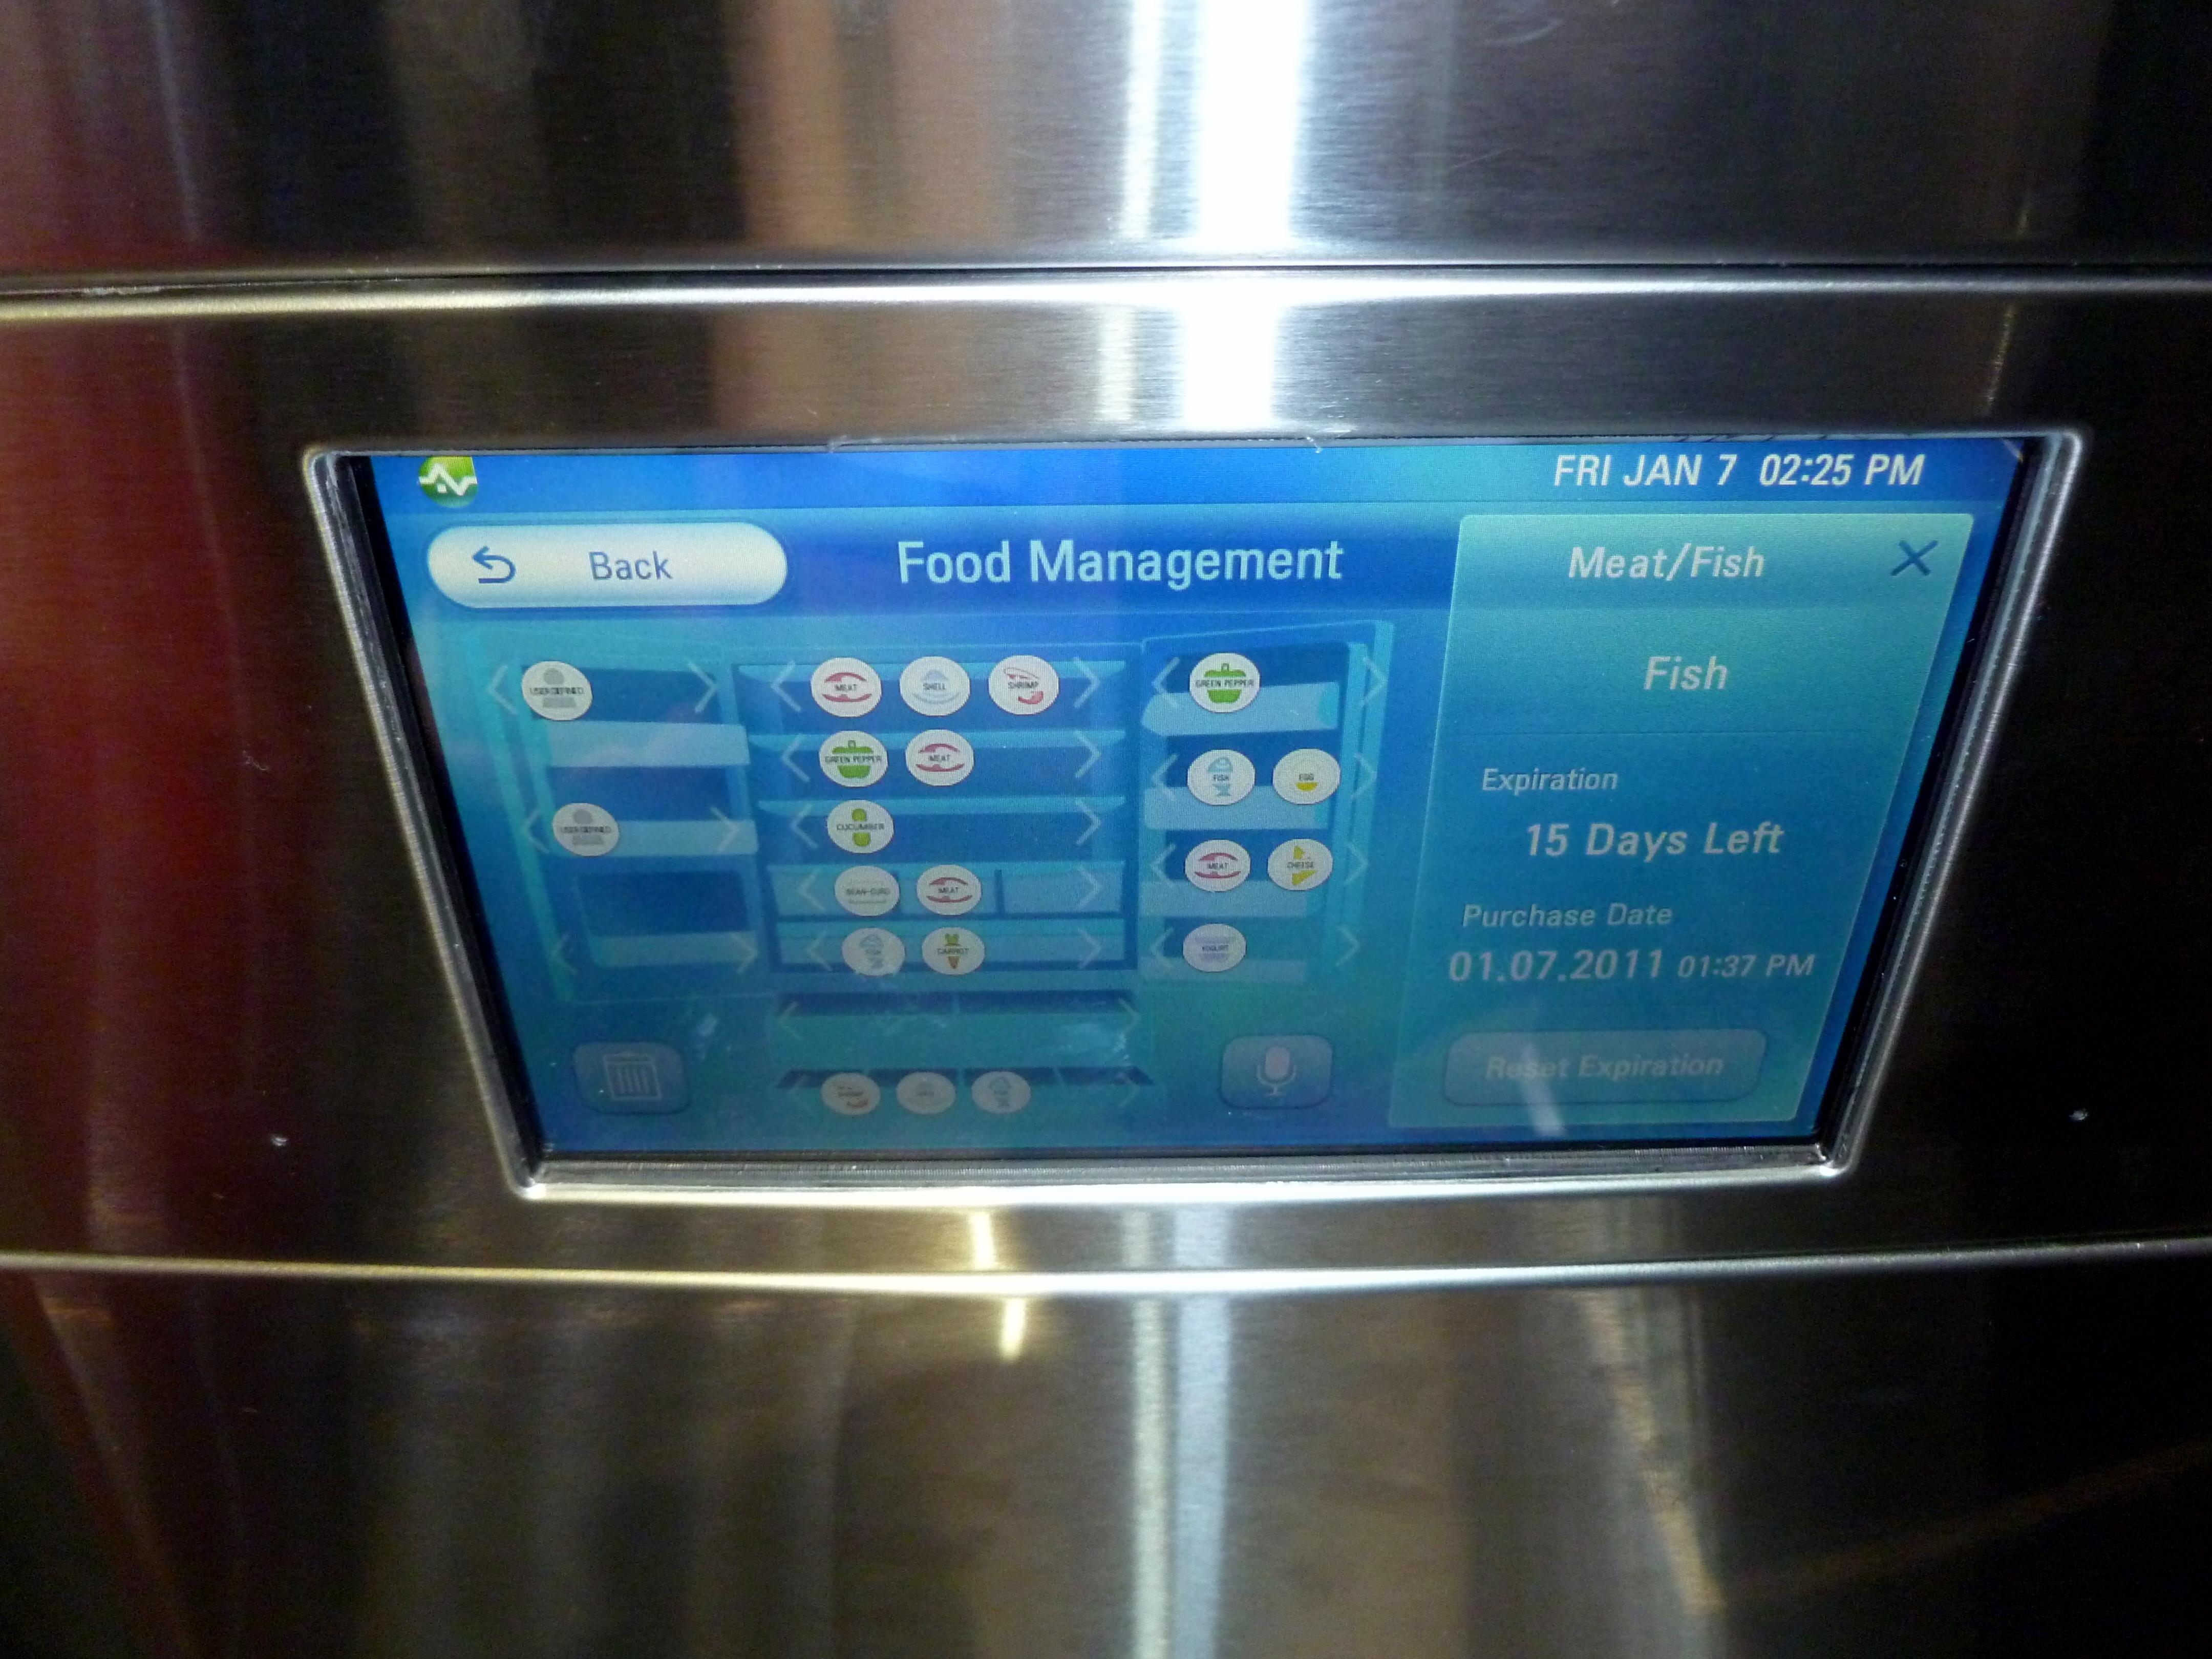 Bomann Kühlschrank Wiki : Smart refrigerator wikipedia